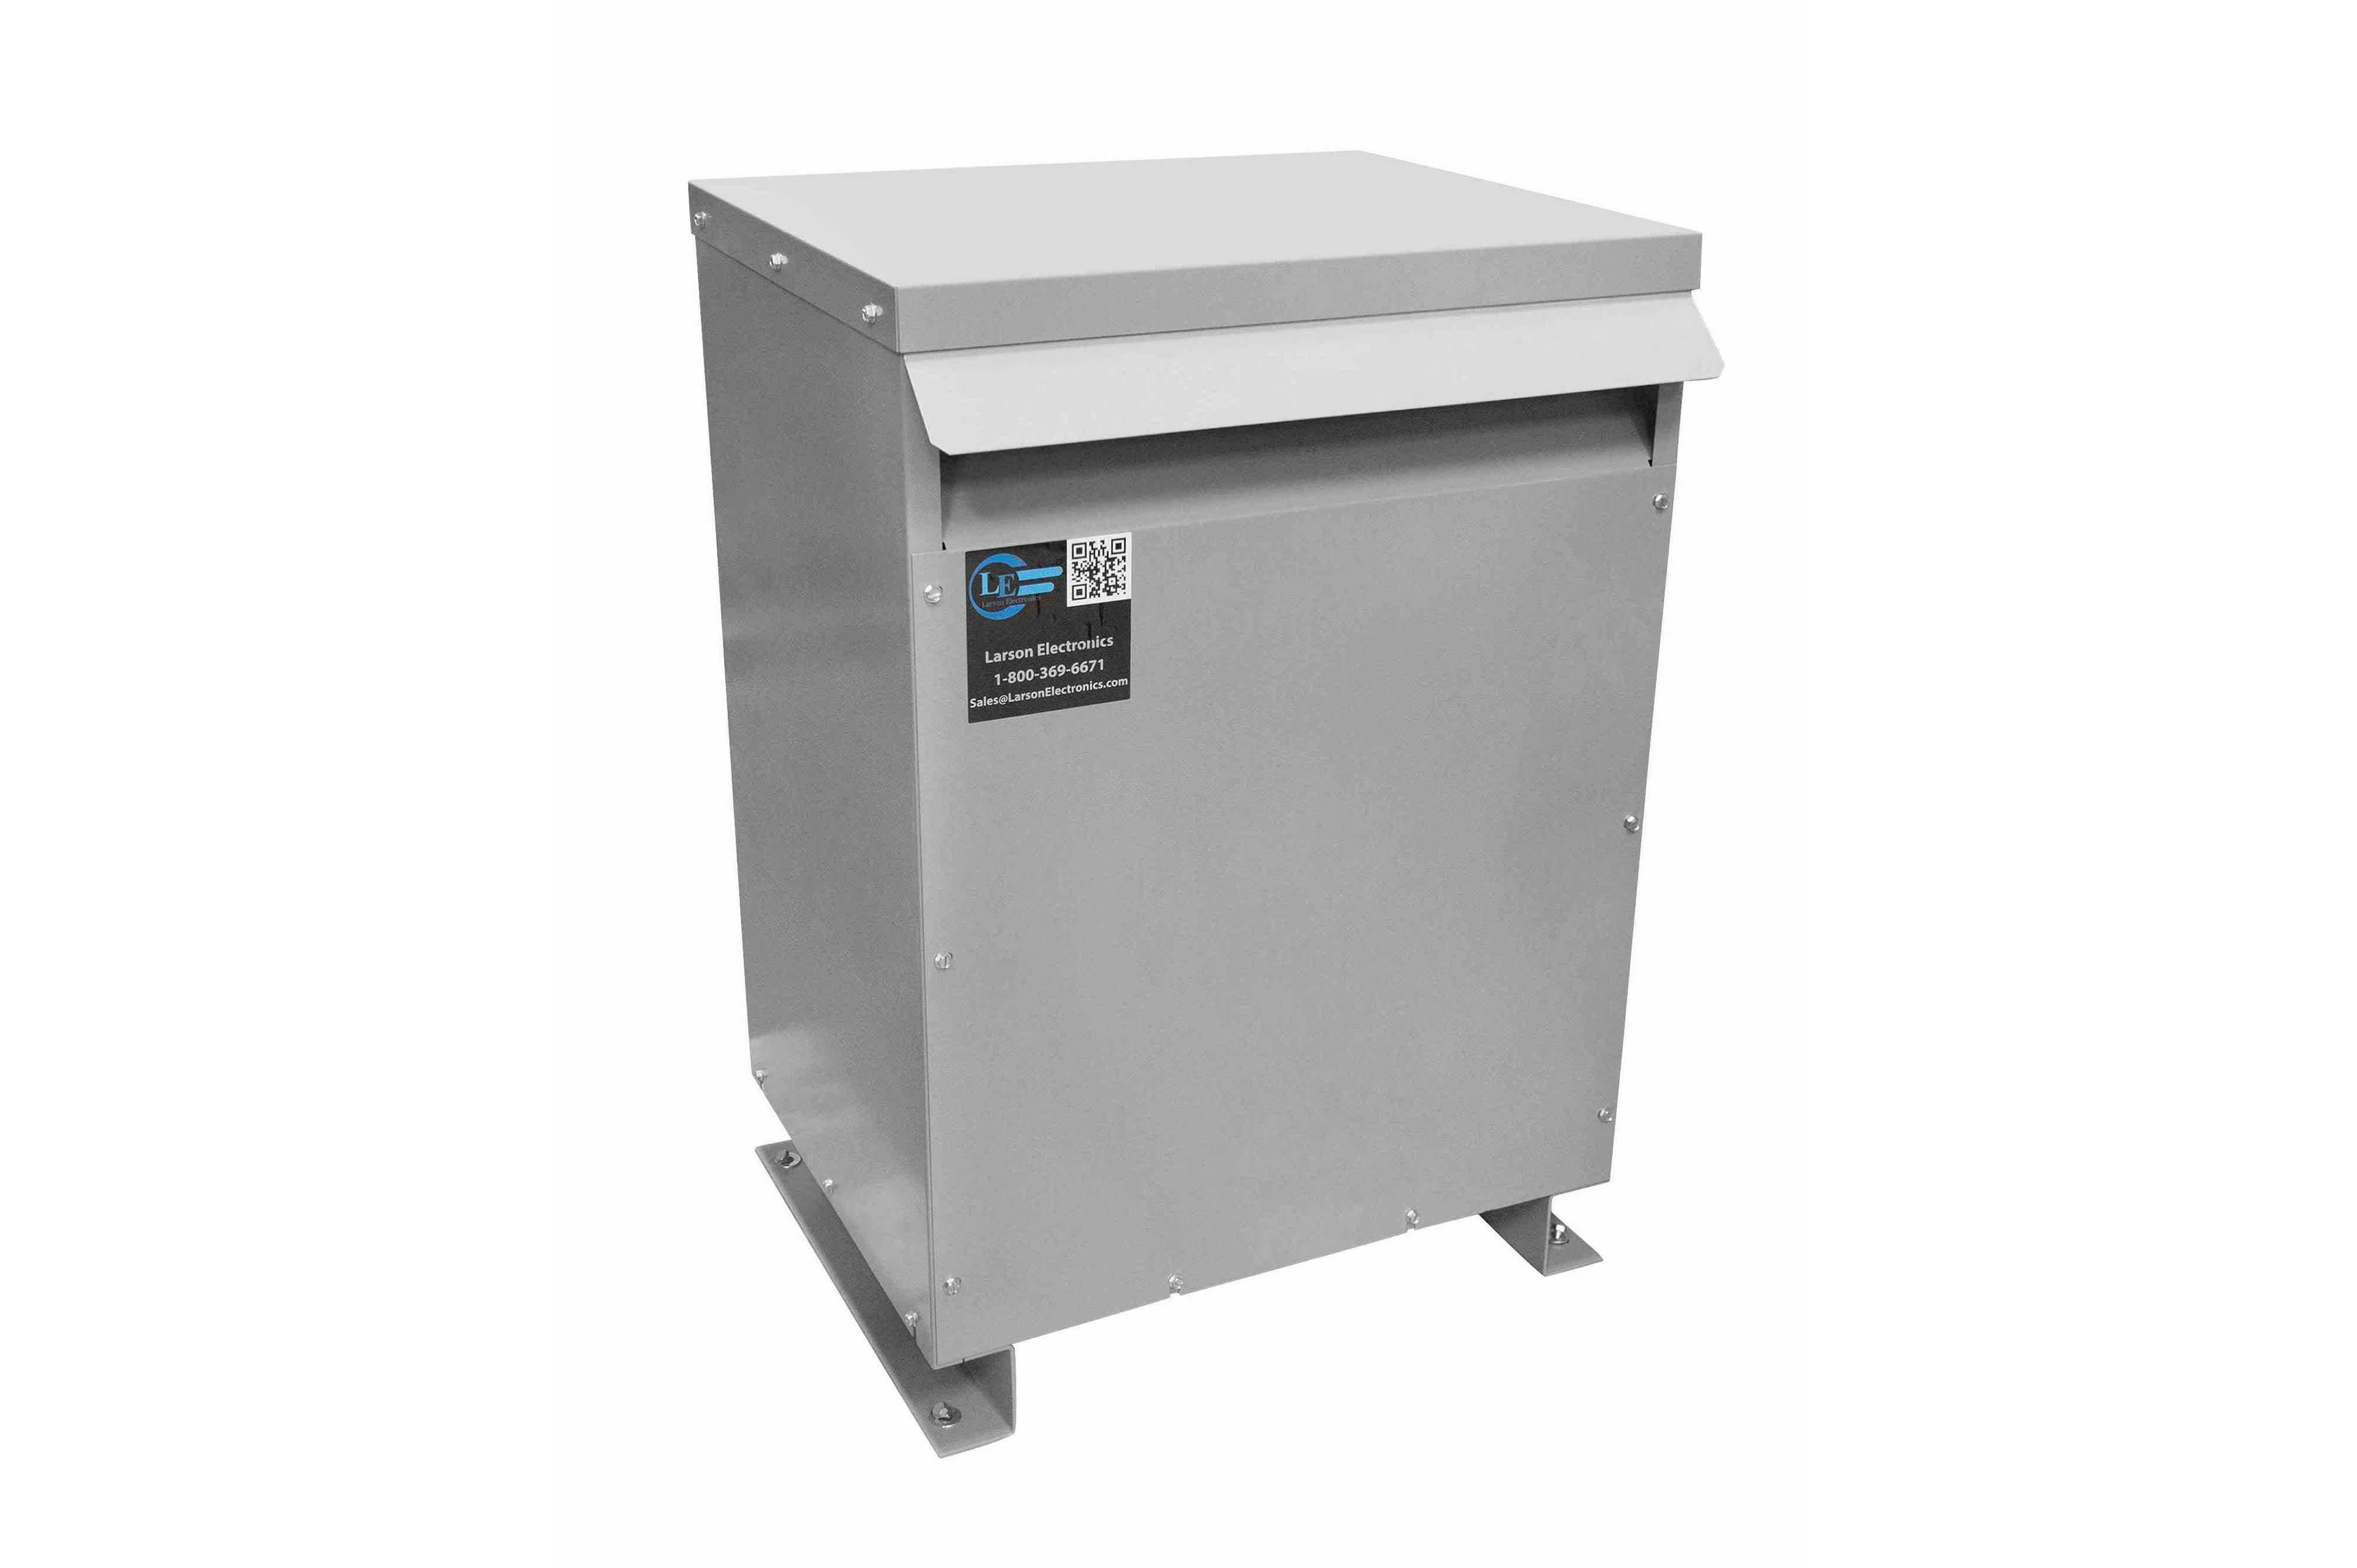 55 kVA 3PH Isolation Transformer, 600V Wye Primary, 415V Delta Secondary, N3R, Ventilated, 60 Hz